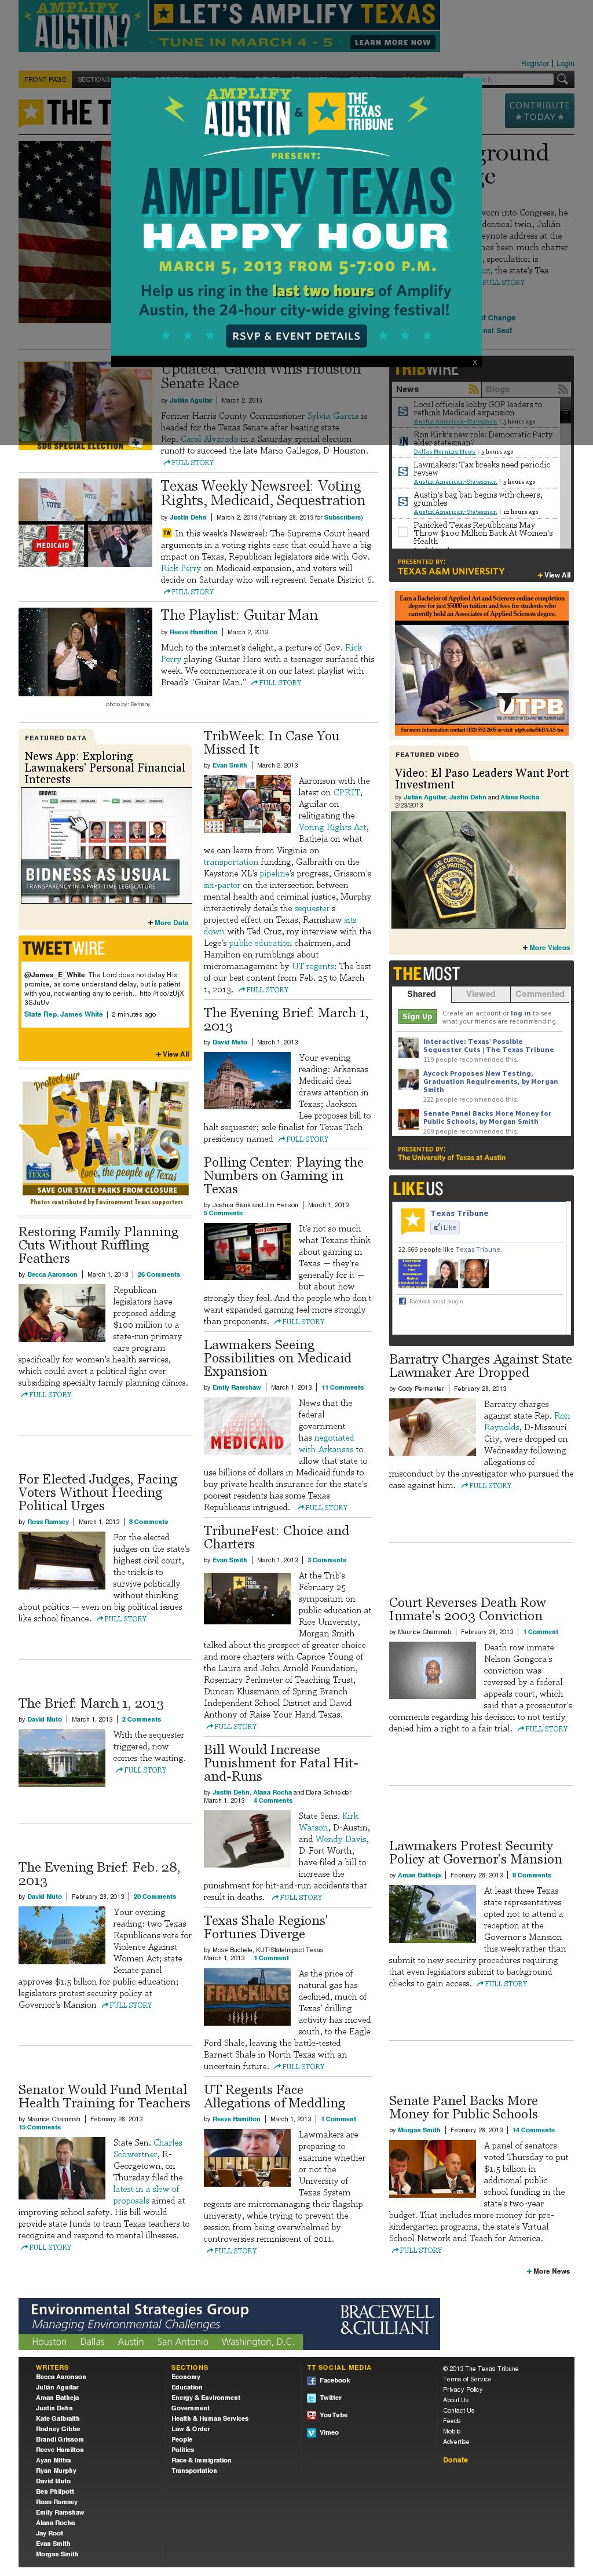 The Texas Tribune at Sunday March 3, 2013, 12:20 p.m. UTC